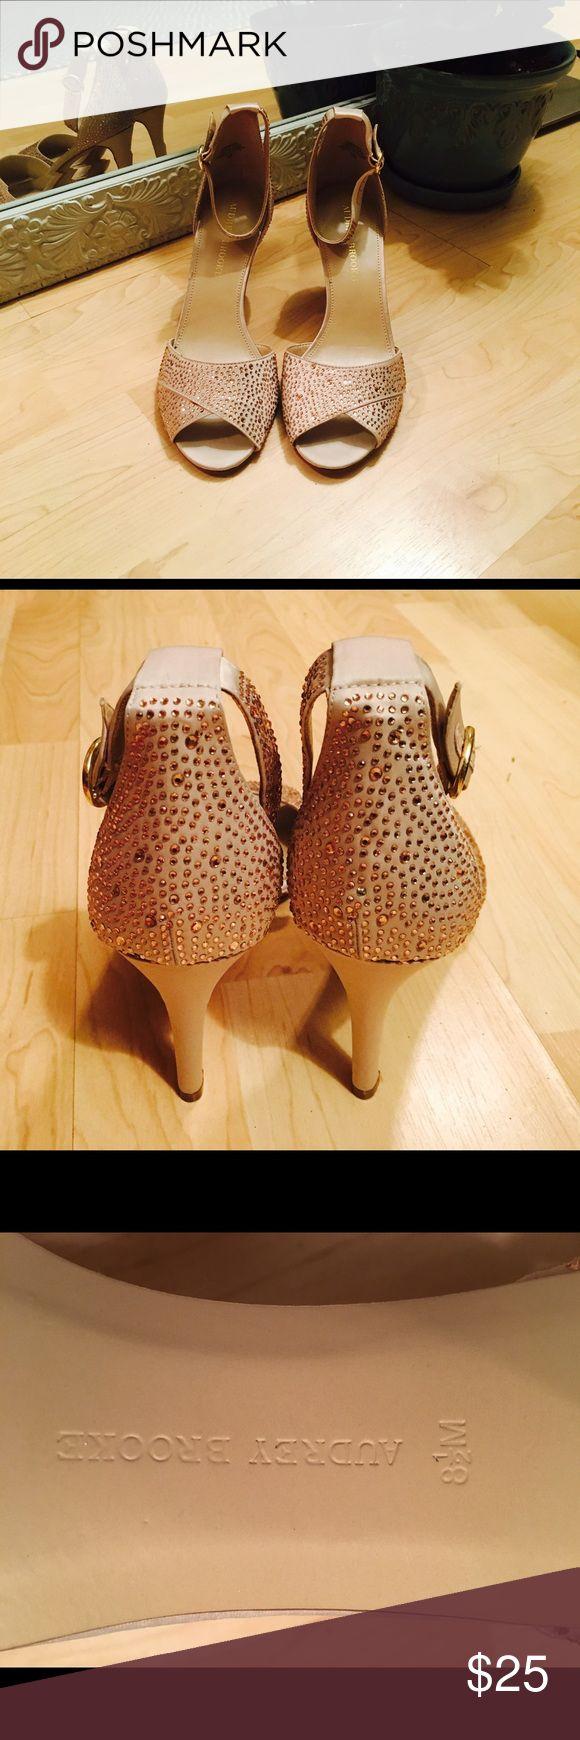 Audrey Brooke Sparkle Pumps Sparkly ankle strap peek toe pumps. Unused, never worn. Peach rhinestones, champagne colored. Audrey Brooke Shoes Heels